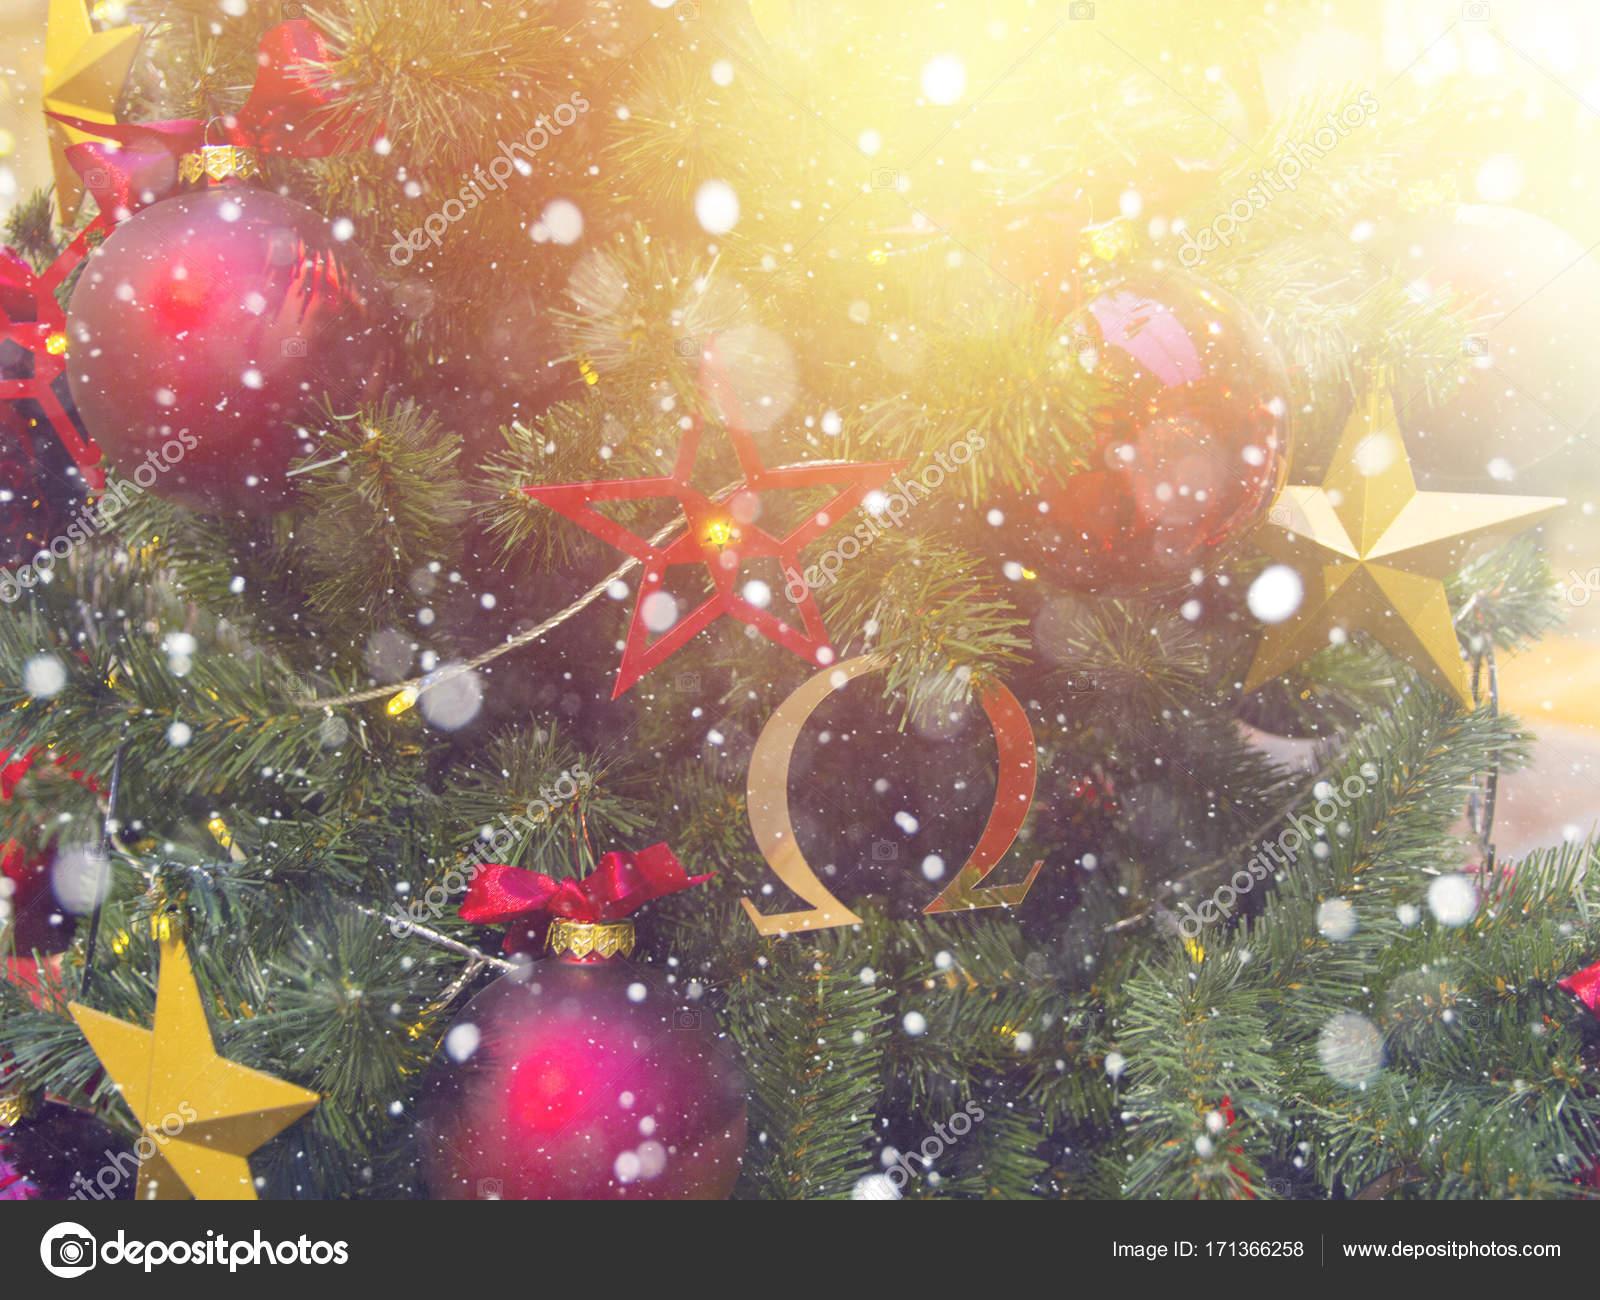 Christmas Horseshoe Art.Horseshoe Art Christmas Tree Christmas Toys Horseshoe On